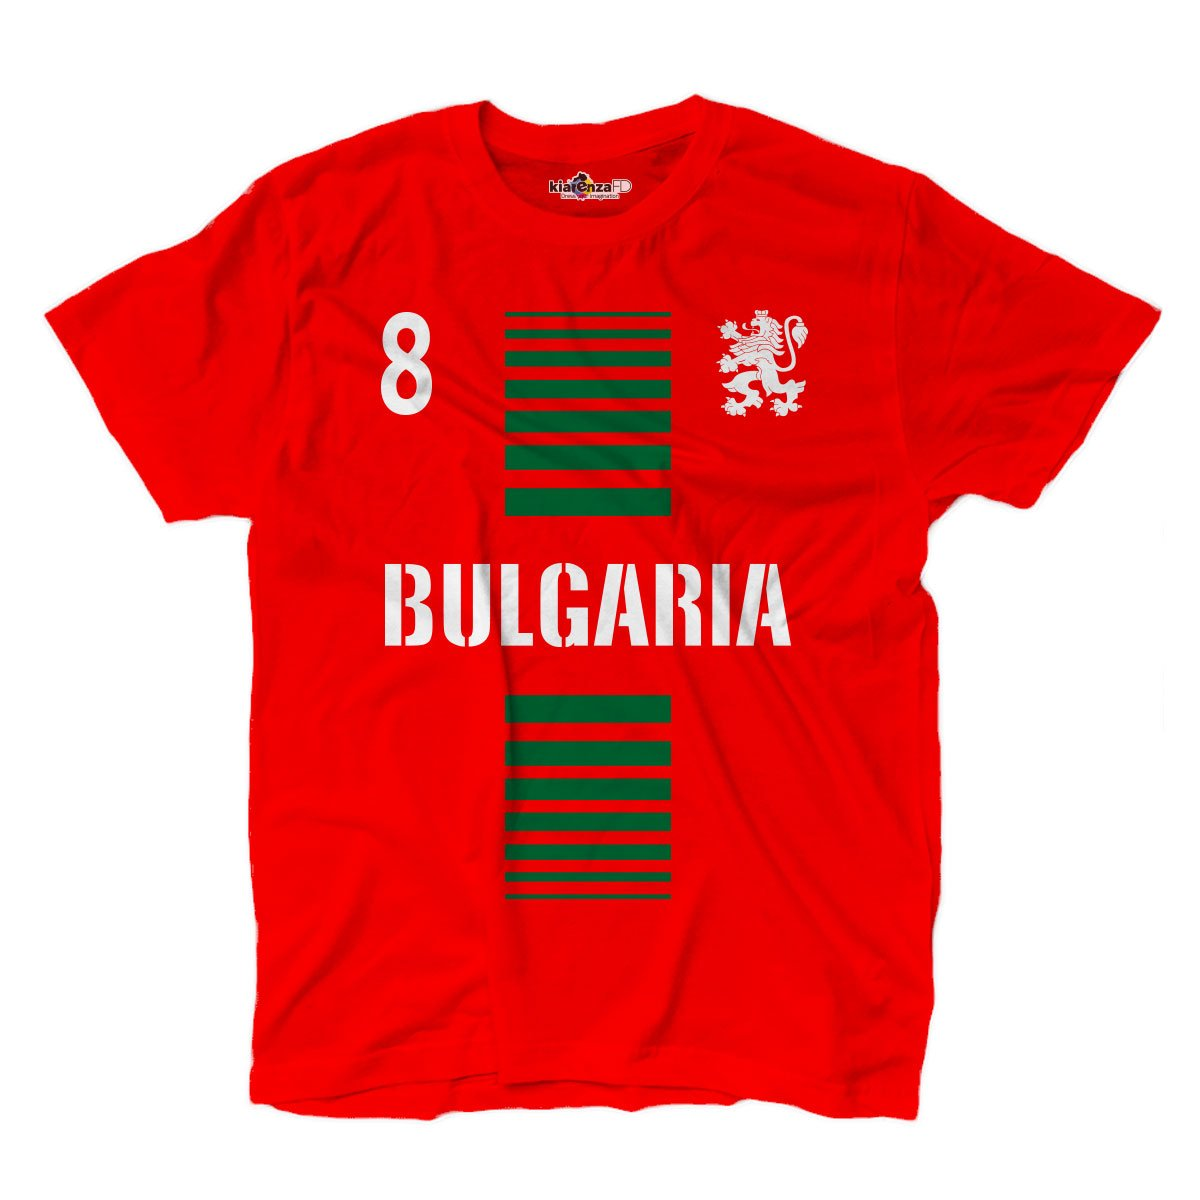 KiarenzaFD T-Shirt Manner National Sport Bulgarien Bulgaria 8 Fussball Sport Europa Leone 2 Streetwear Shirts